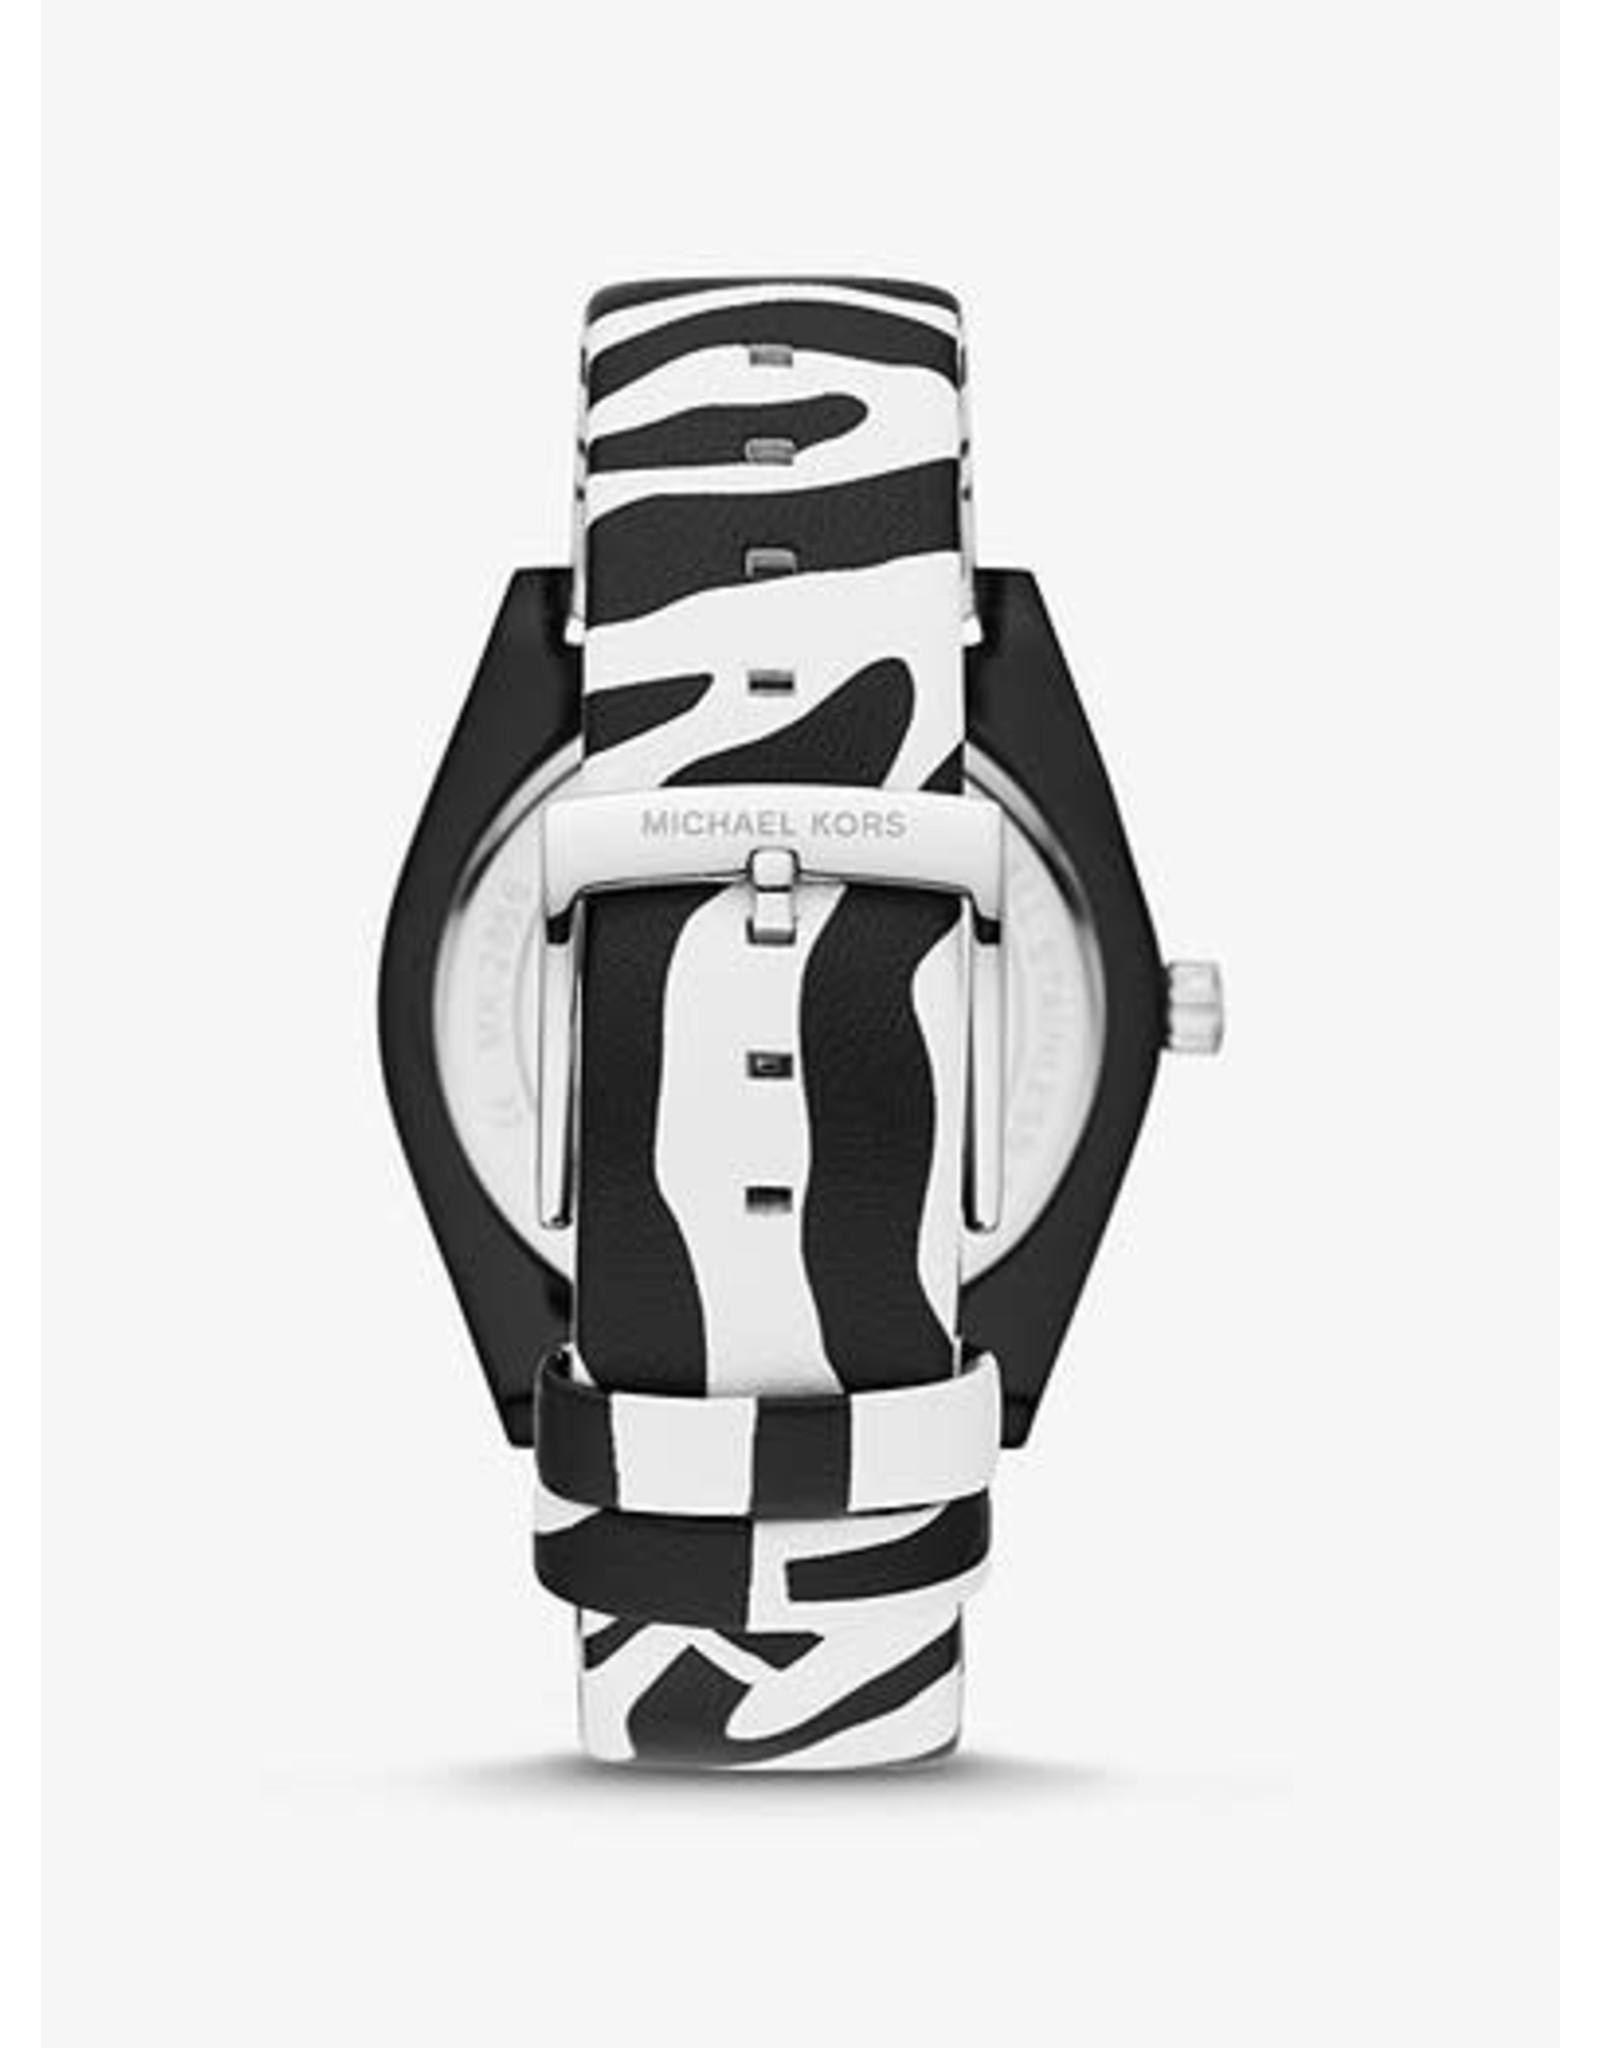 Michael Kors Watch Zebra